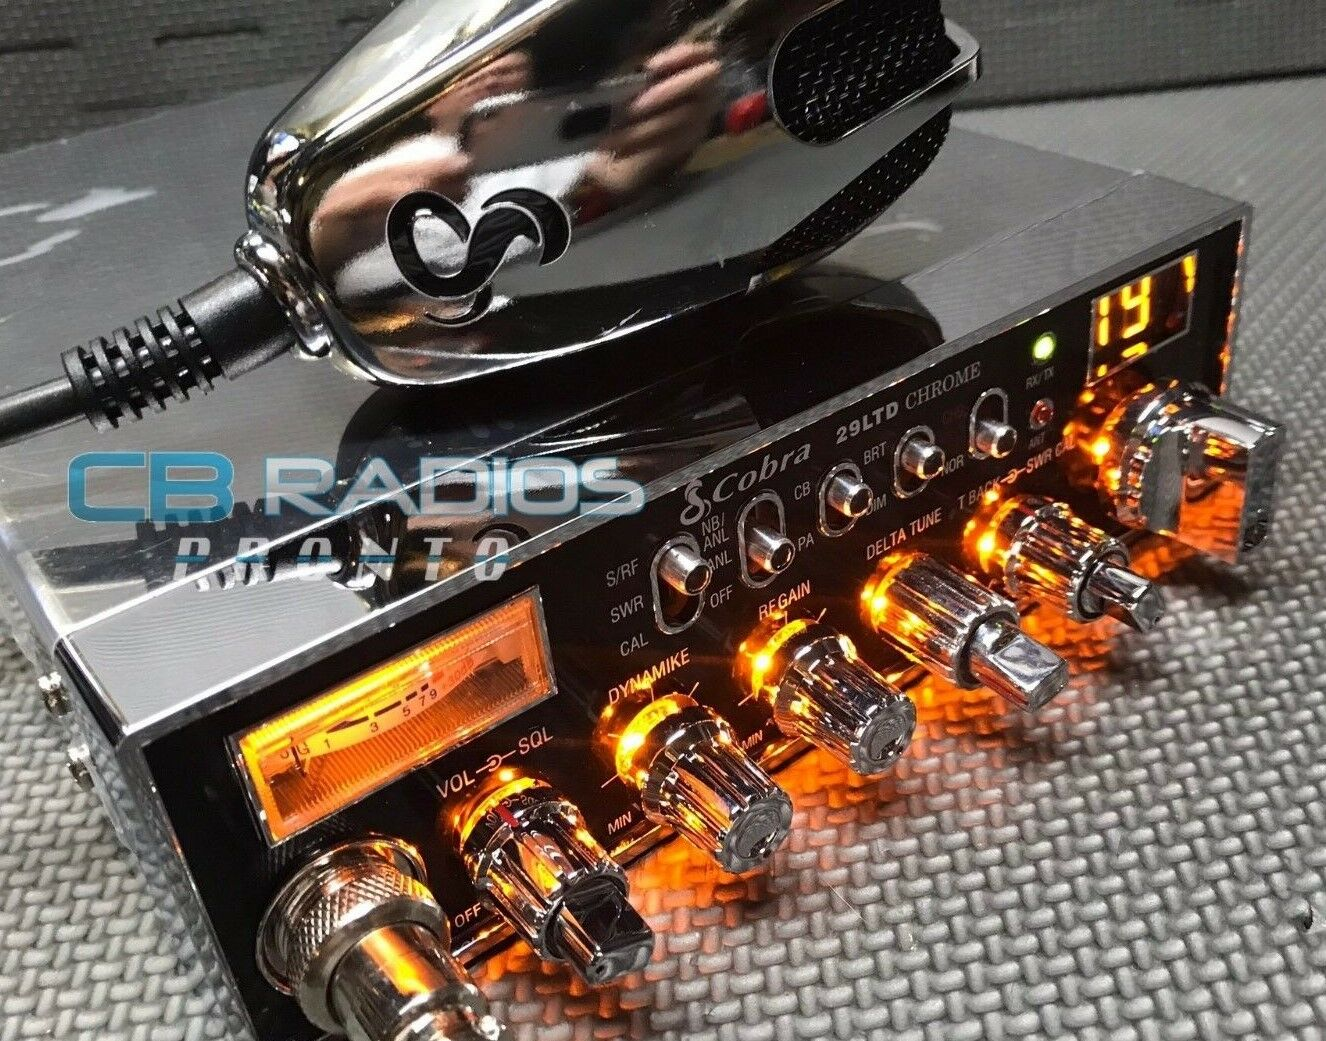 Cobra 29 LTD Chrome - AMBER LIGHT EDITION PERFORMANCE TUNED. Buy it now for 289.95